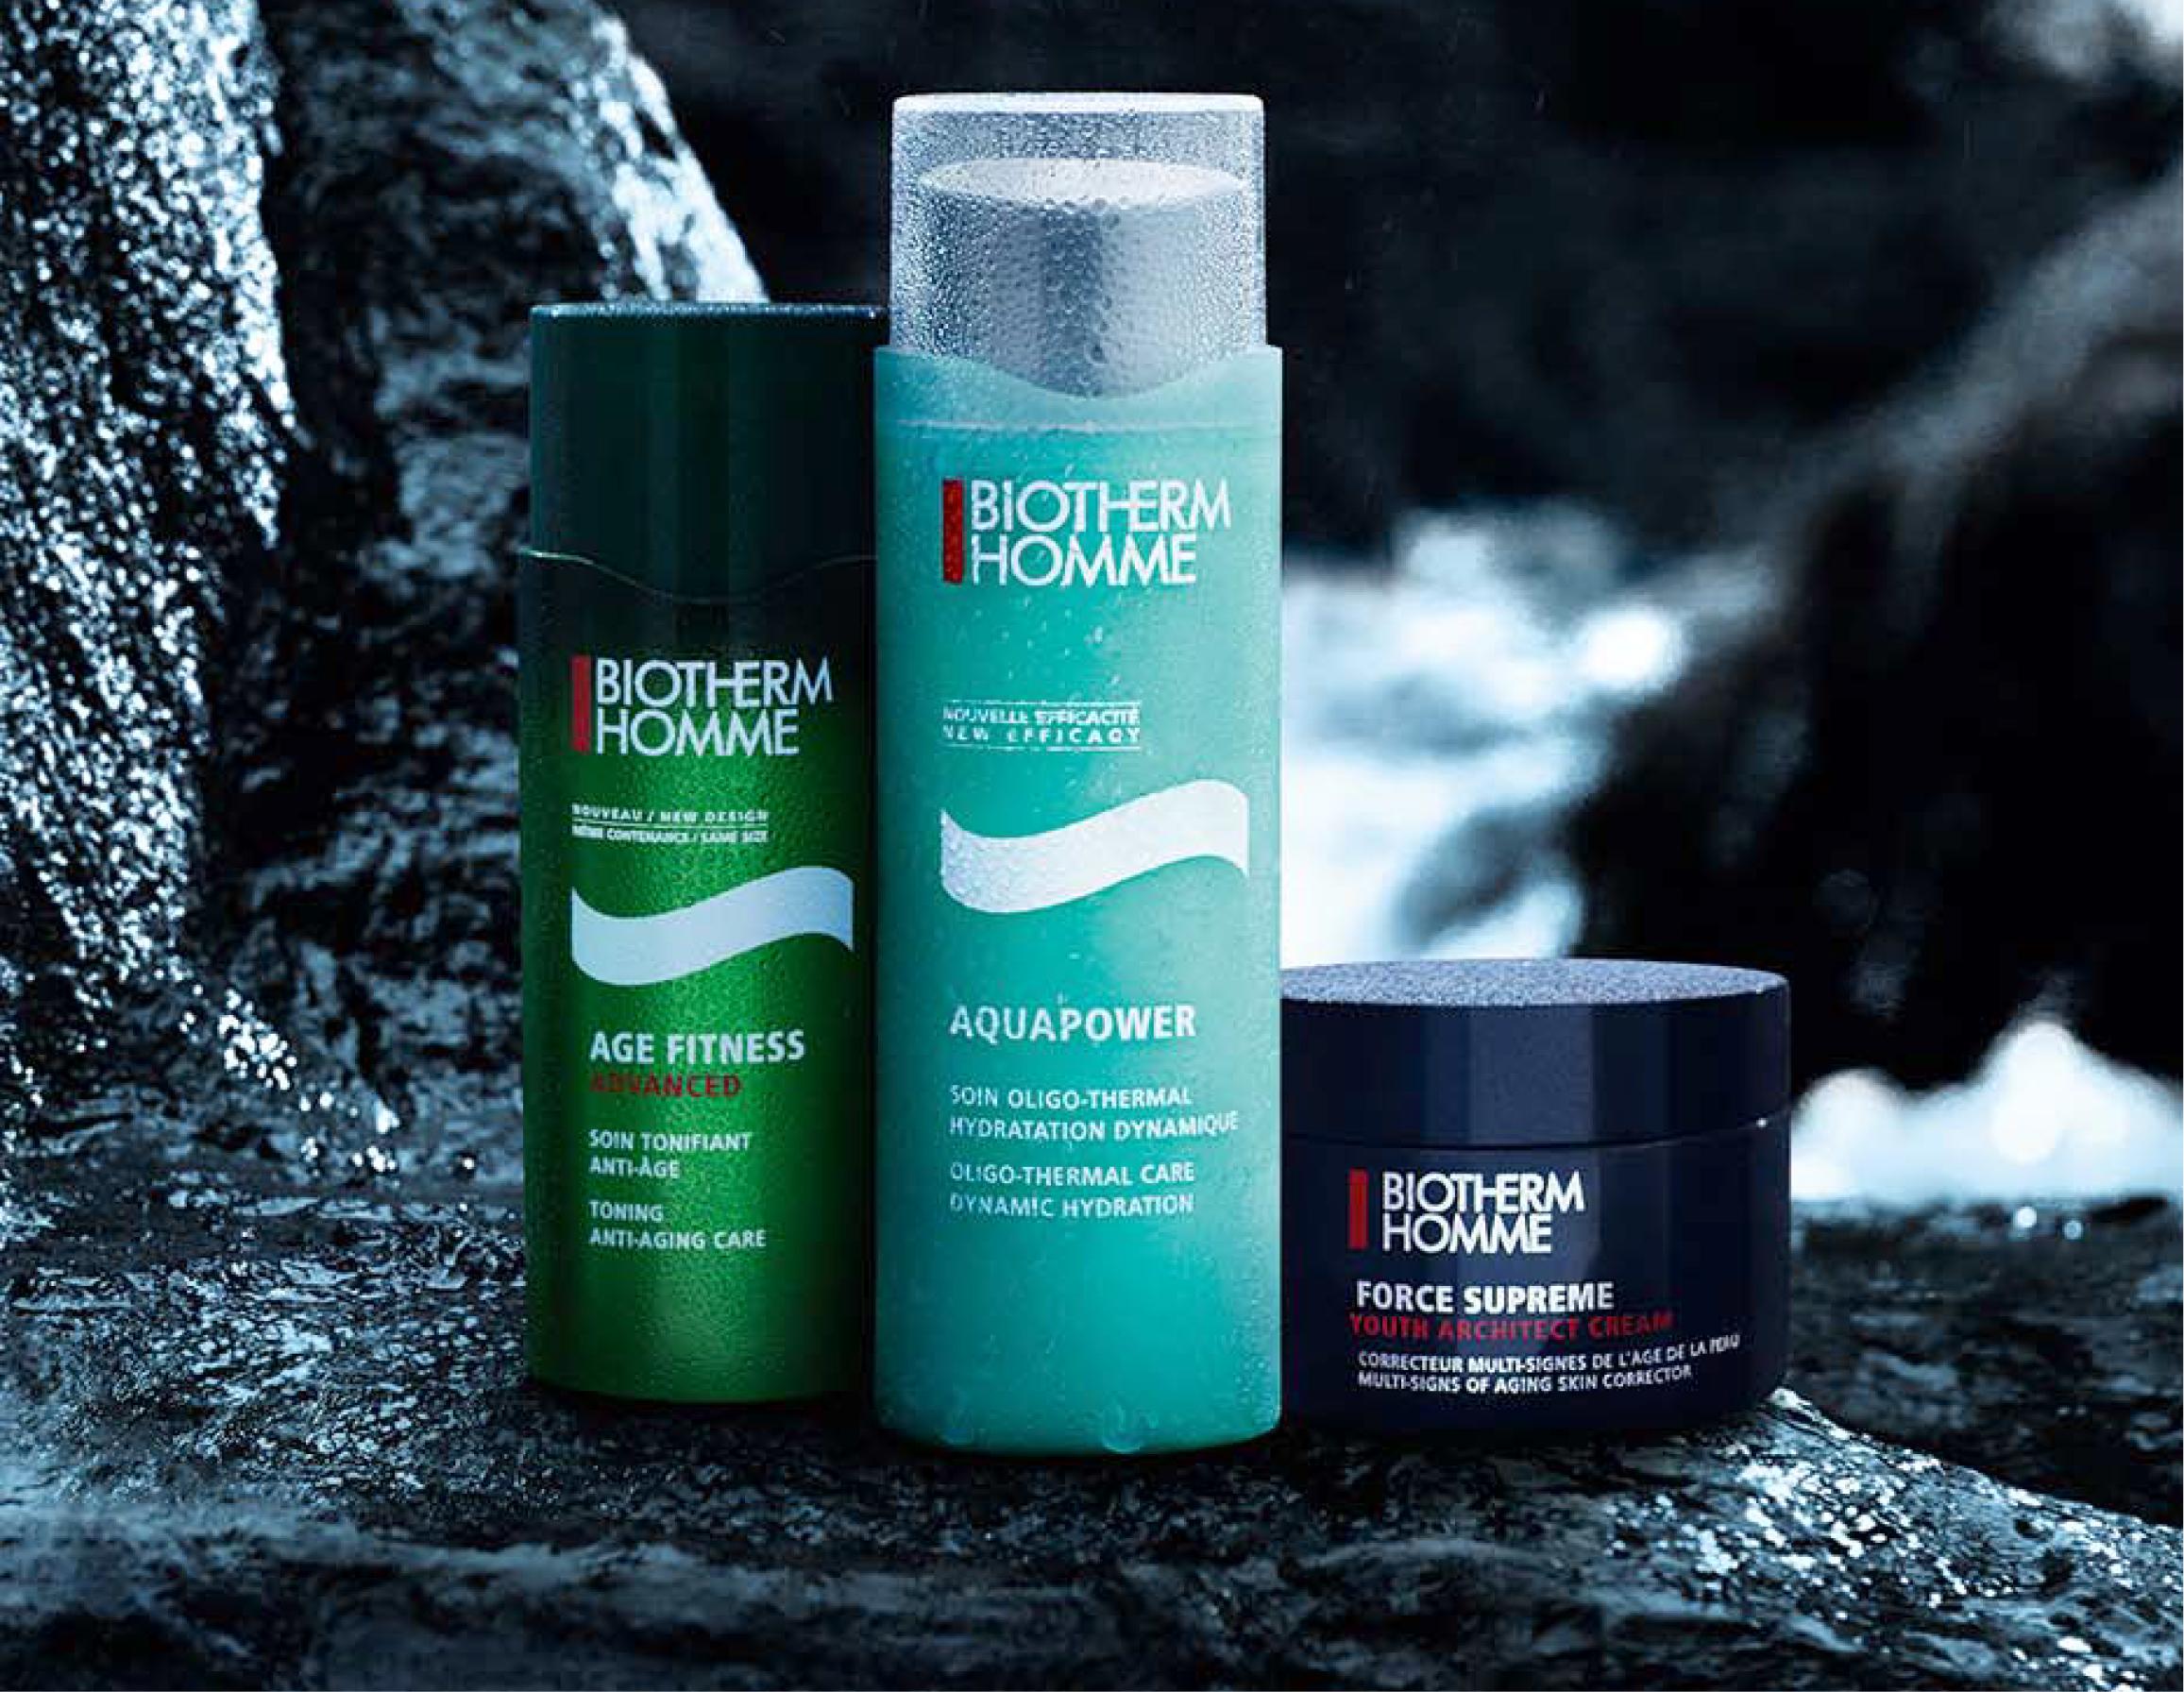 Biotherm_Femme_Homme_555x43022